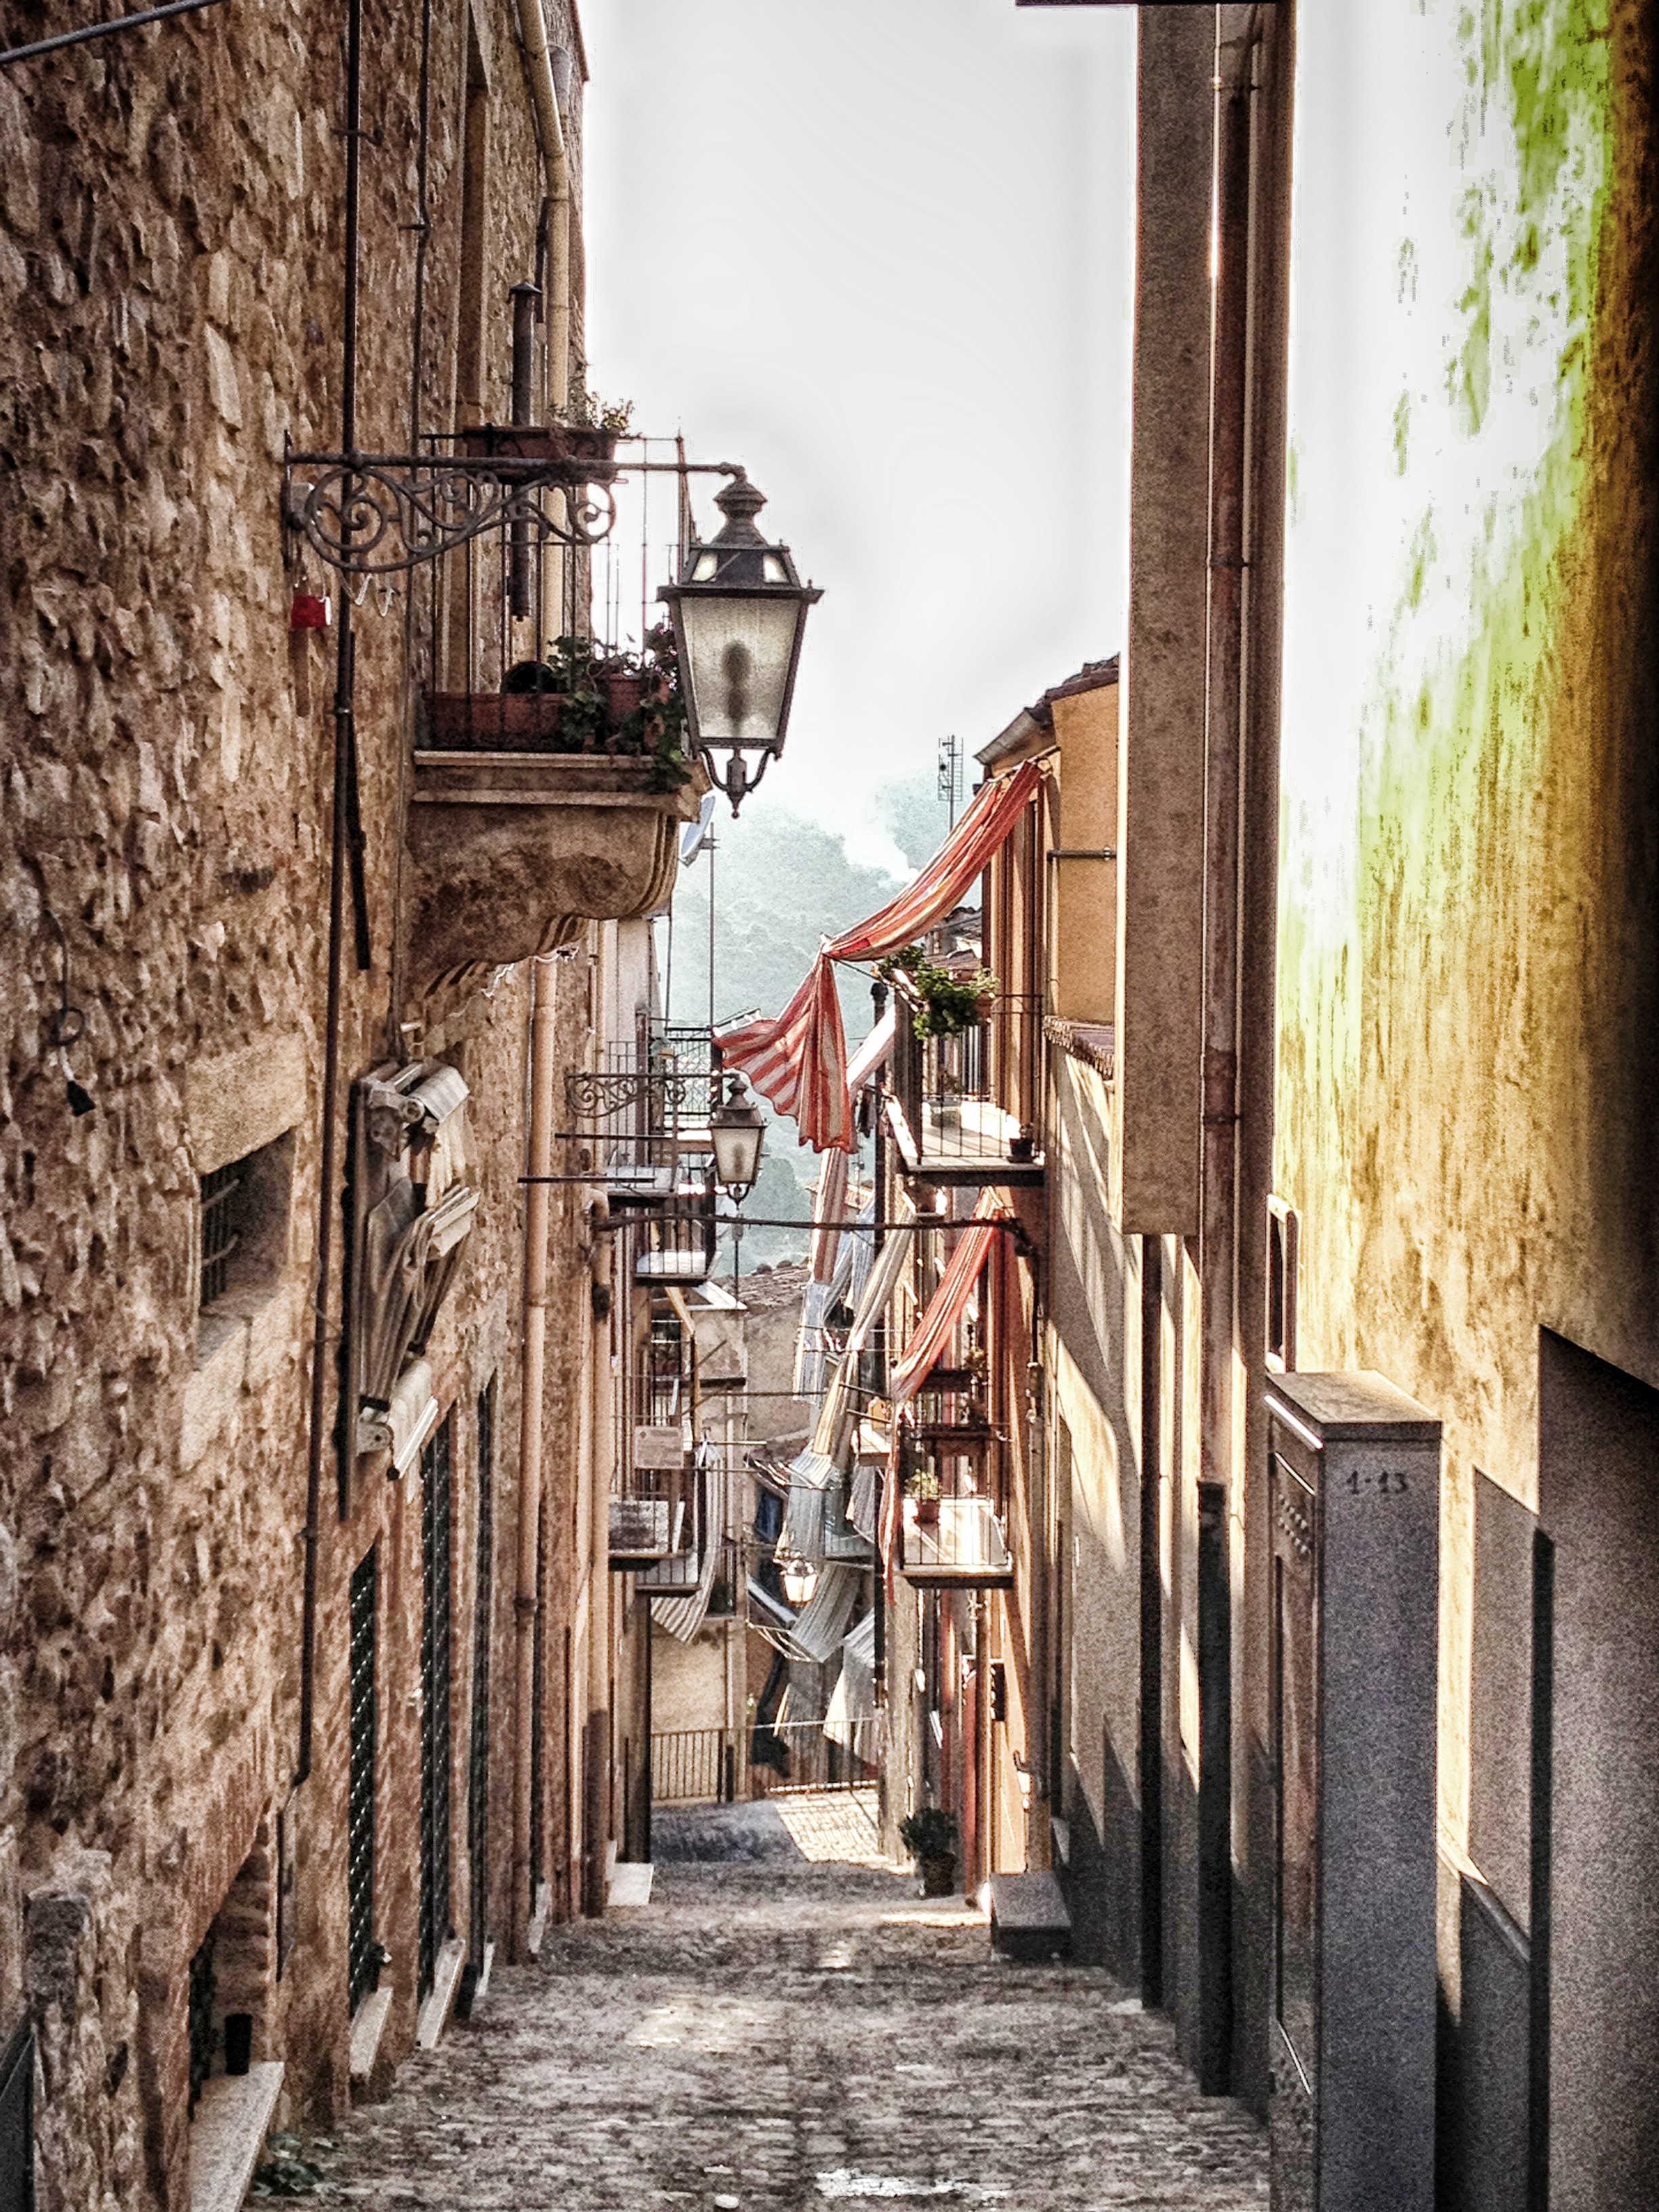 Sizilien-Urlaub-Rundreise-Orte-Altstadt-Tipps